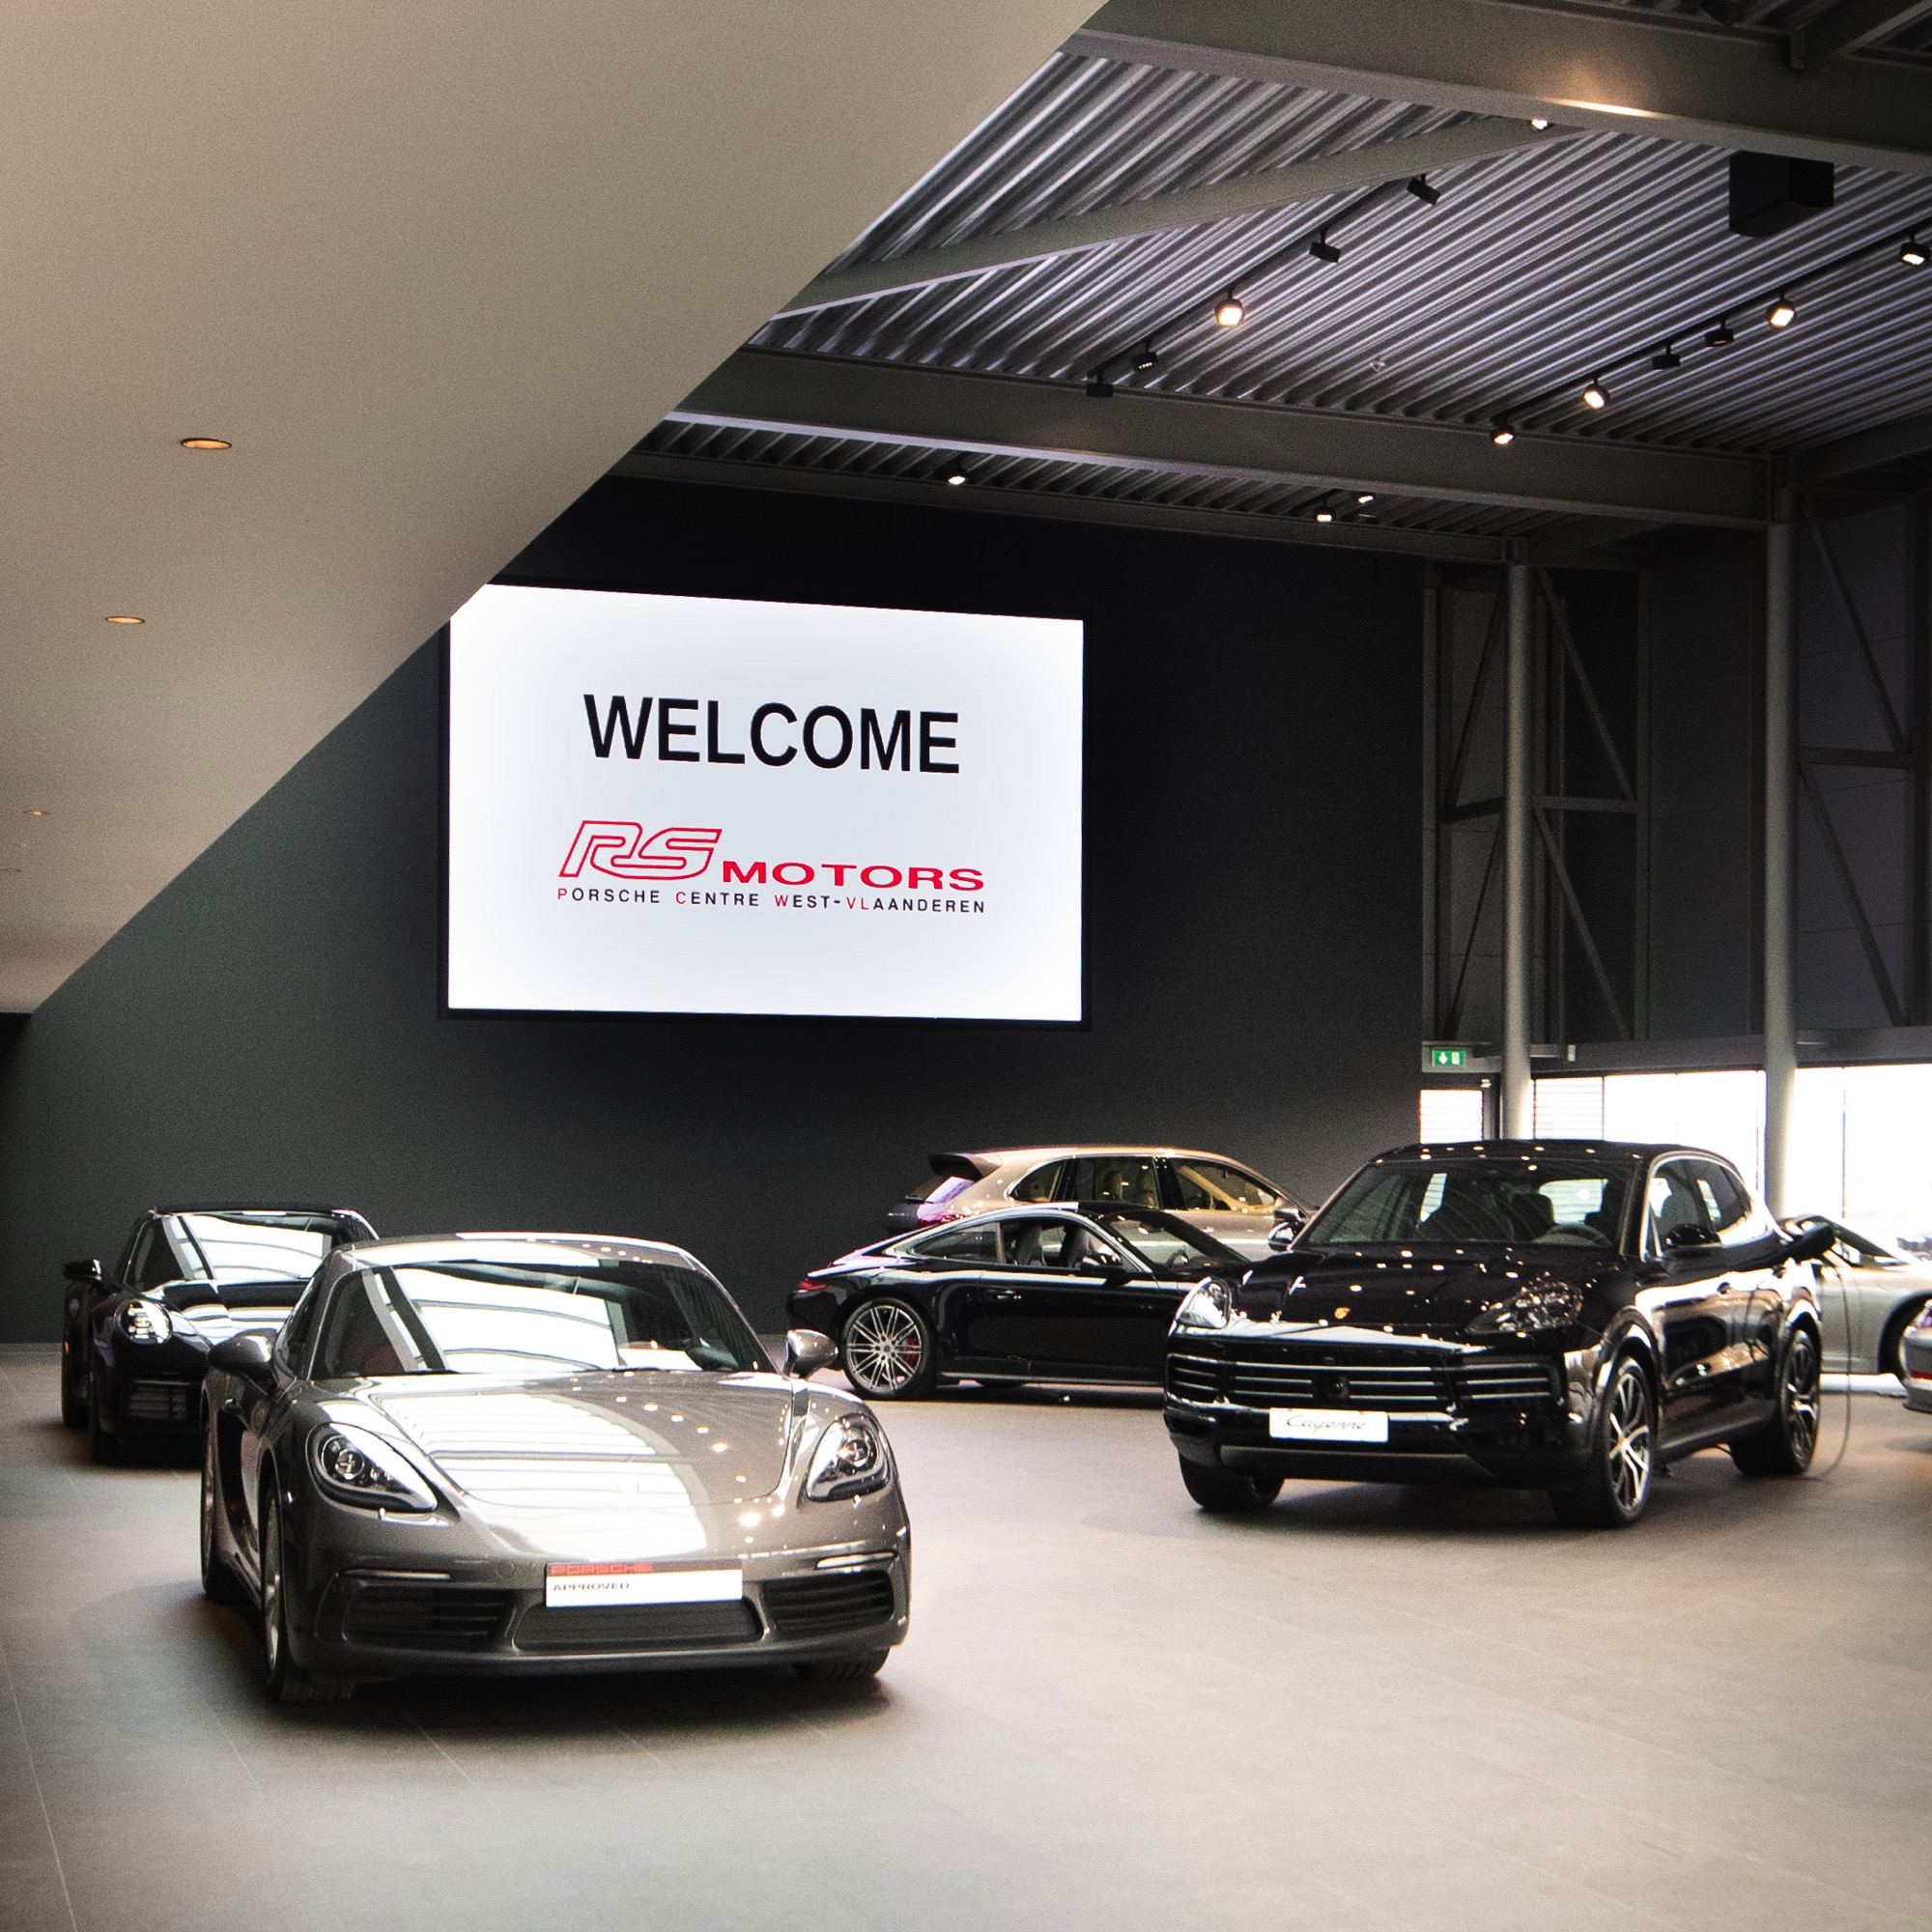 Porsche RS Motors